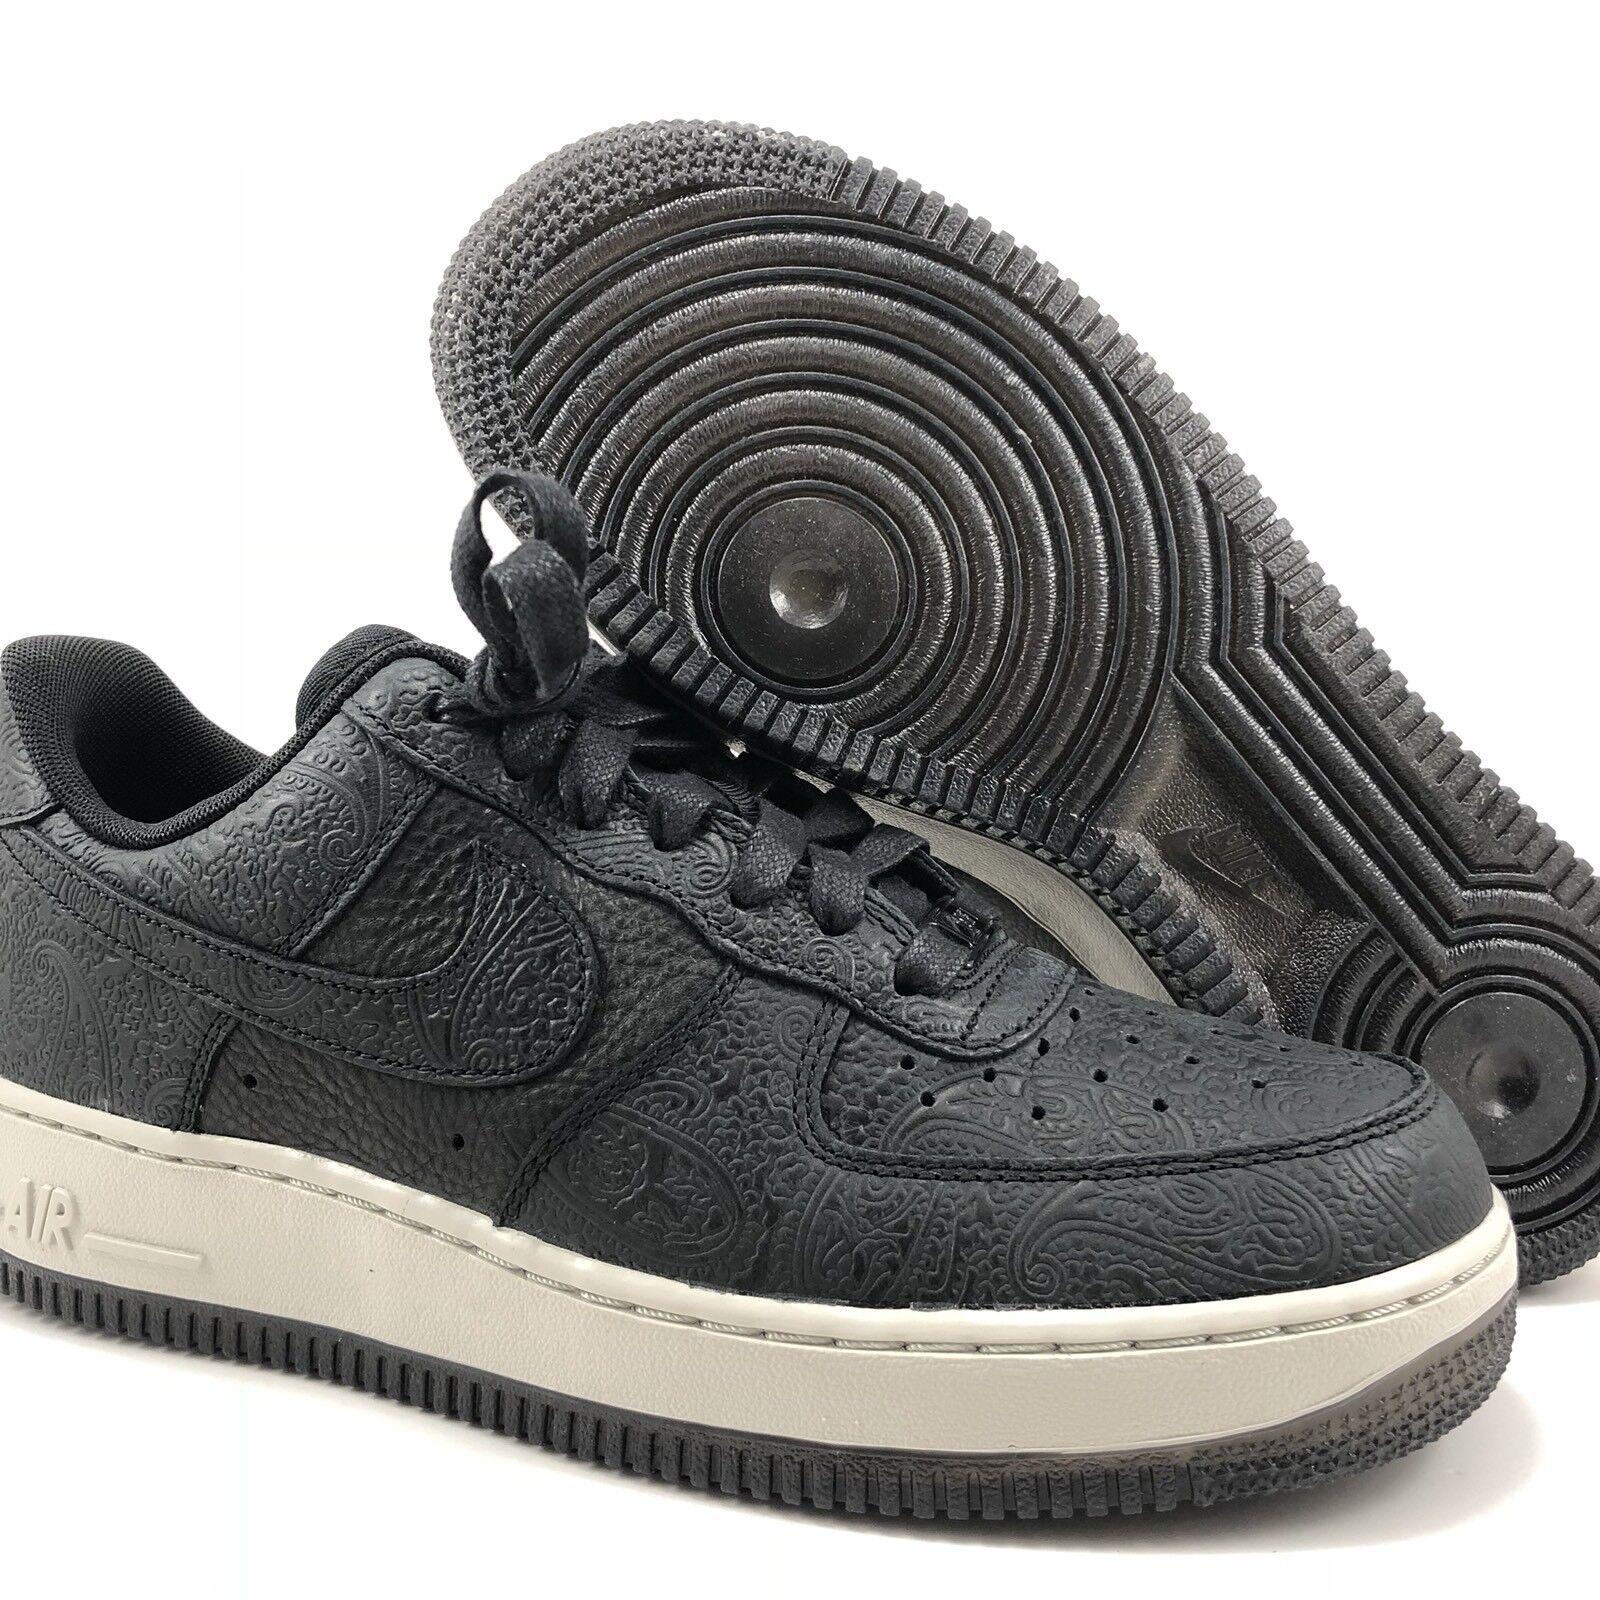 Nike Air Force 1 '07 PRM Essential Black Womens Size 8.5 (860532 001)